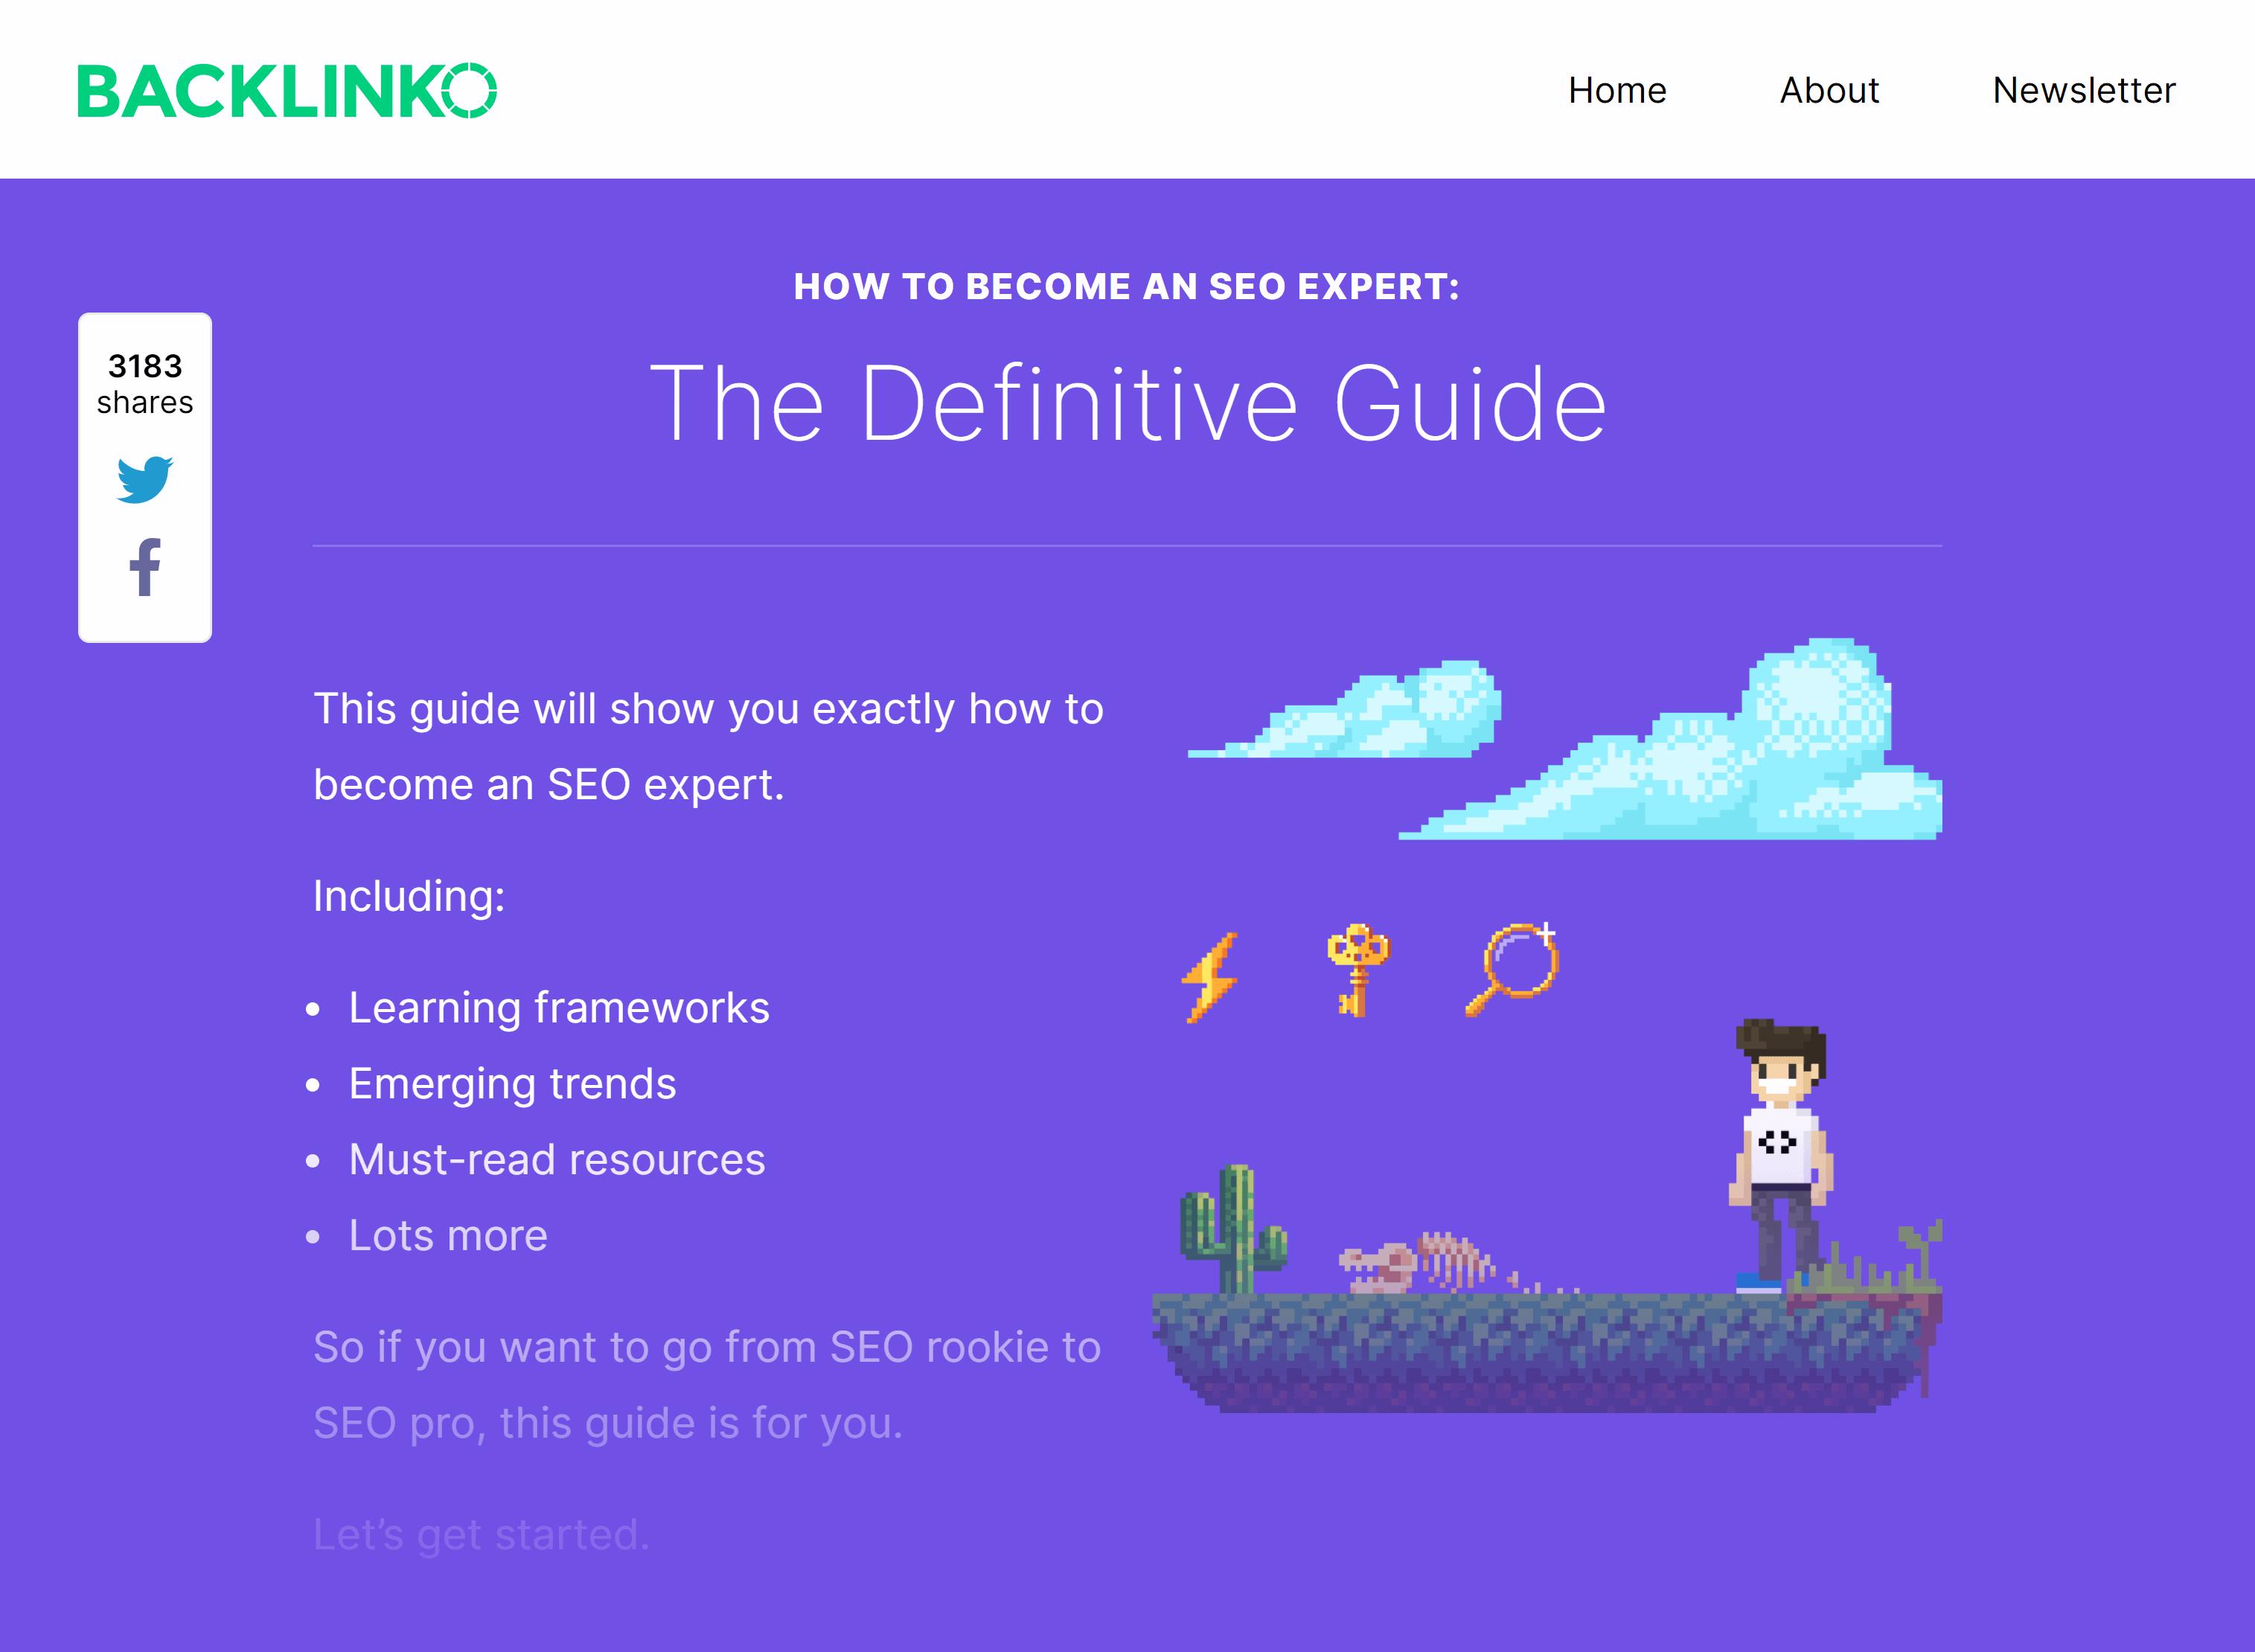 Backlinko – SEO Expert Guide